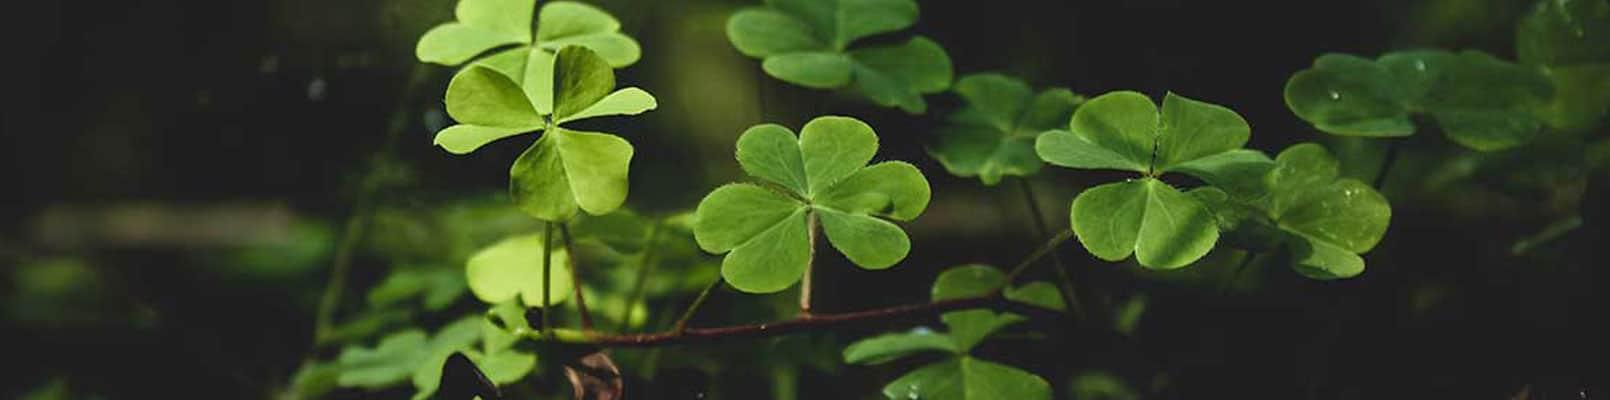 superstitii noroc din România